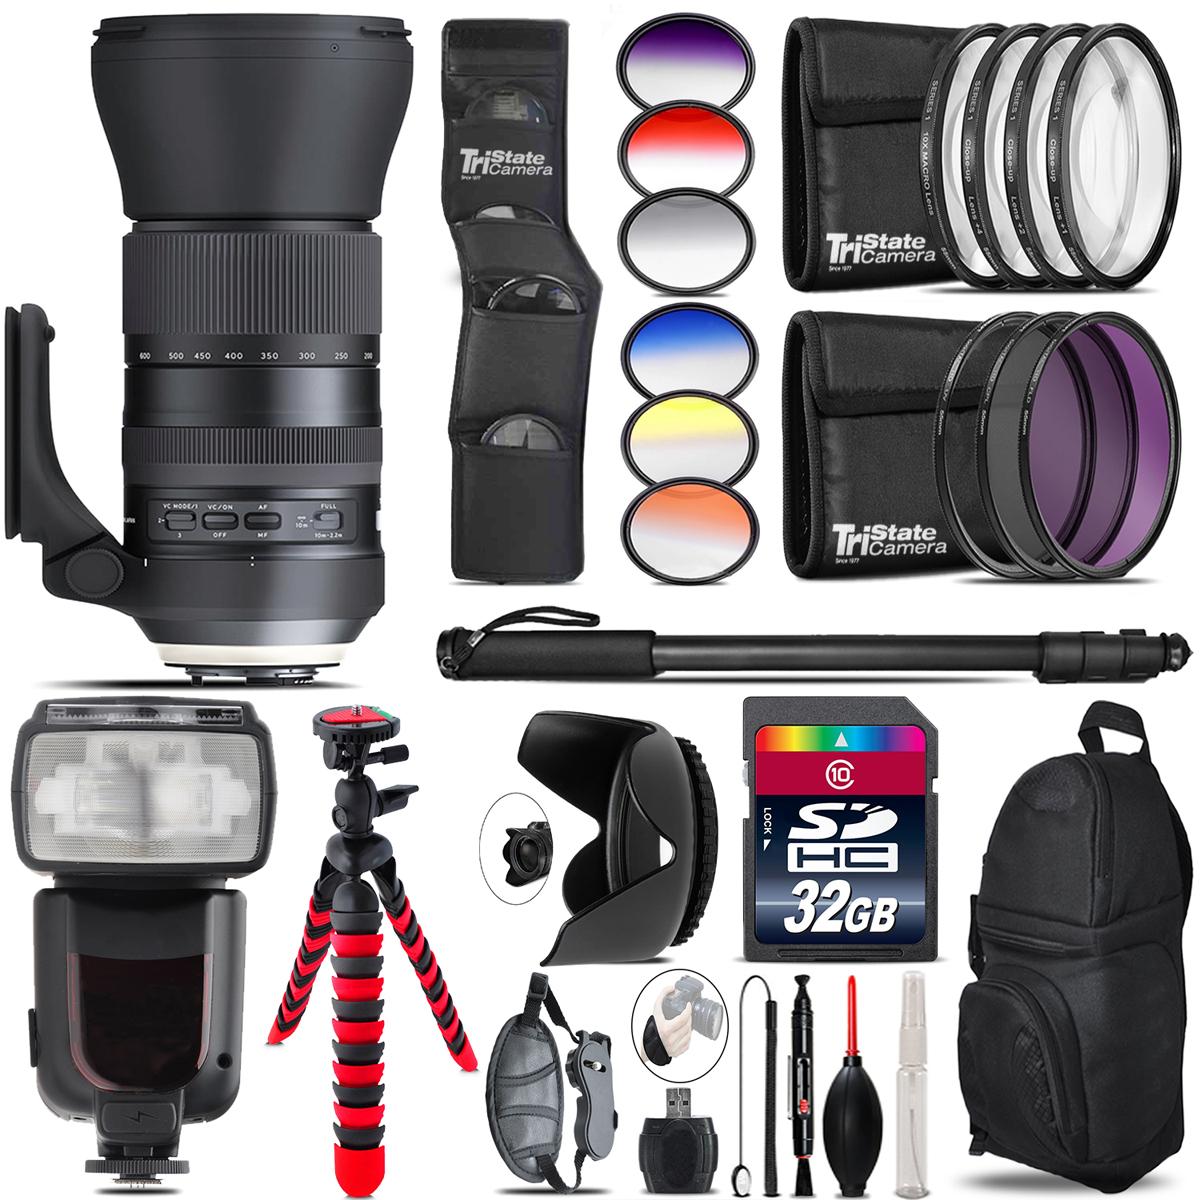 Tamron 150-600mm G2 for Nikon + Pro Flash + Filter Kit - 32GB Accessory Kit *FREE SHIPPING*